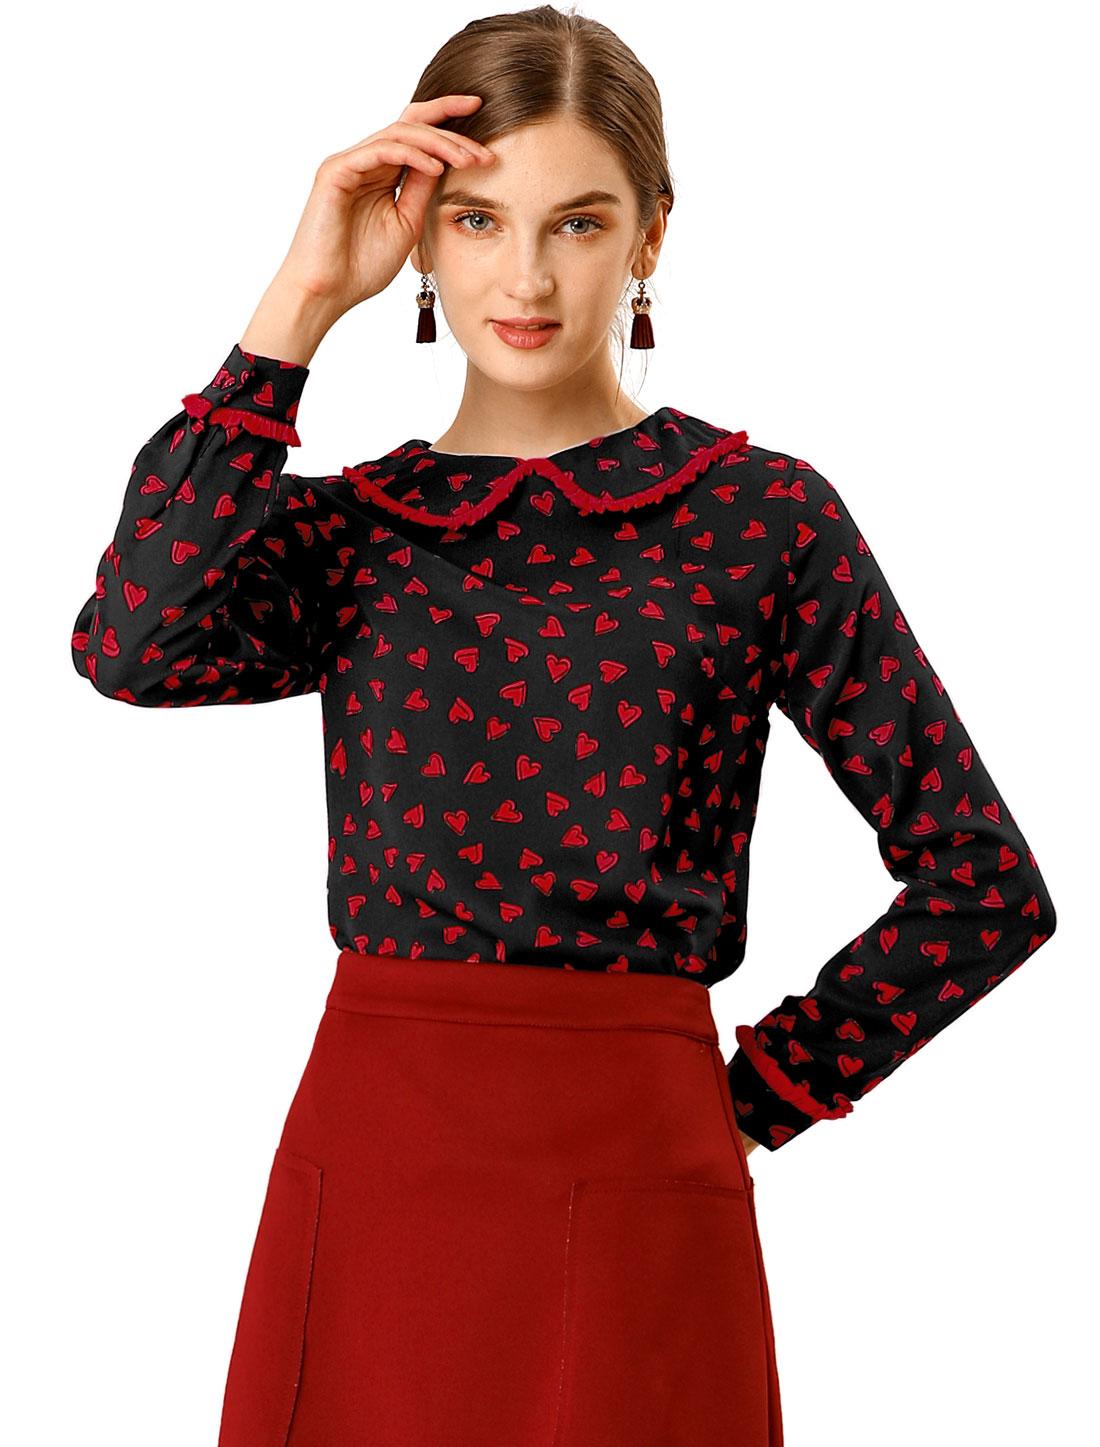 Allegra K Women's Cute Ruffle Peter Pan Collar Blouse Black XS